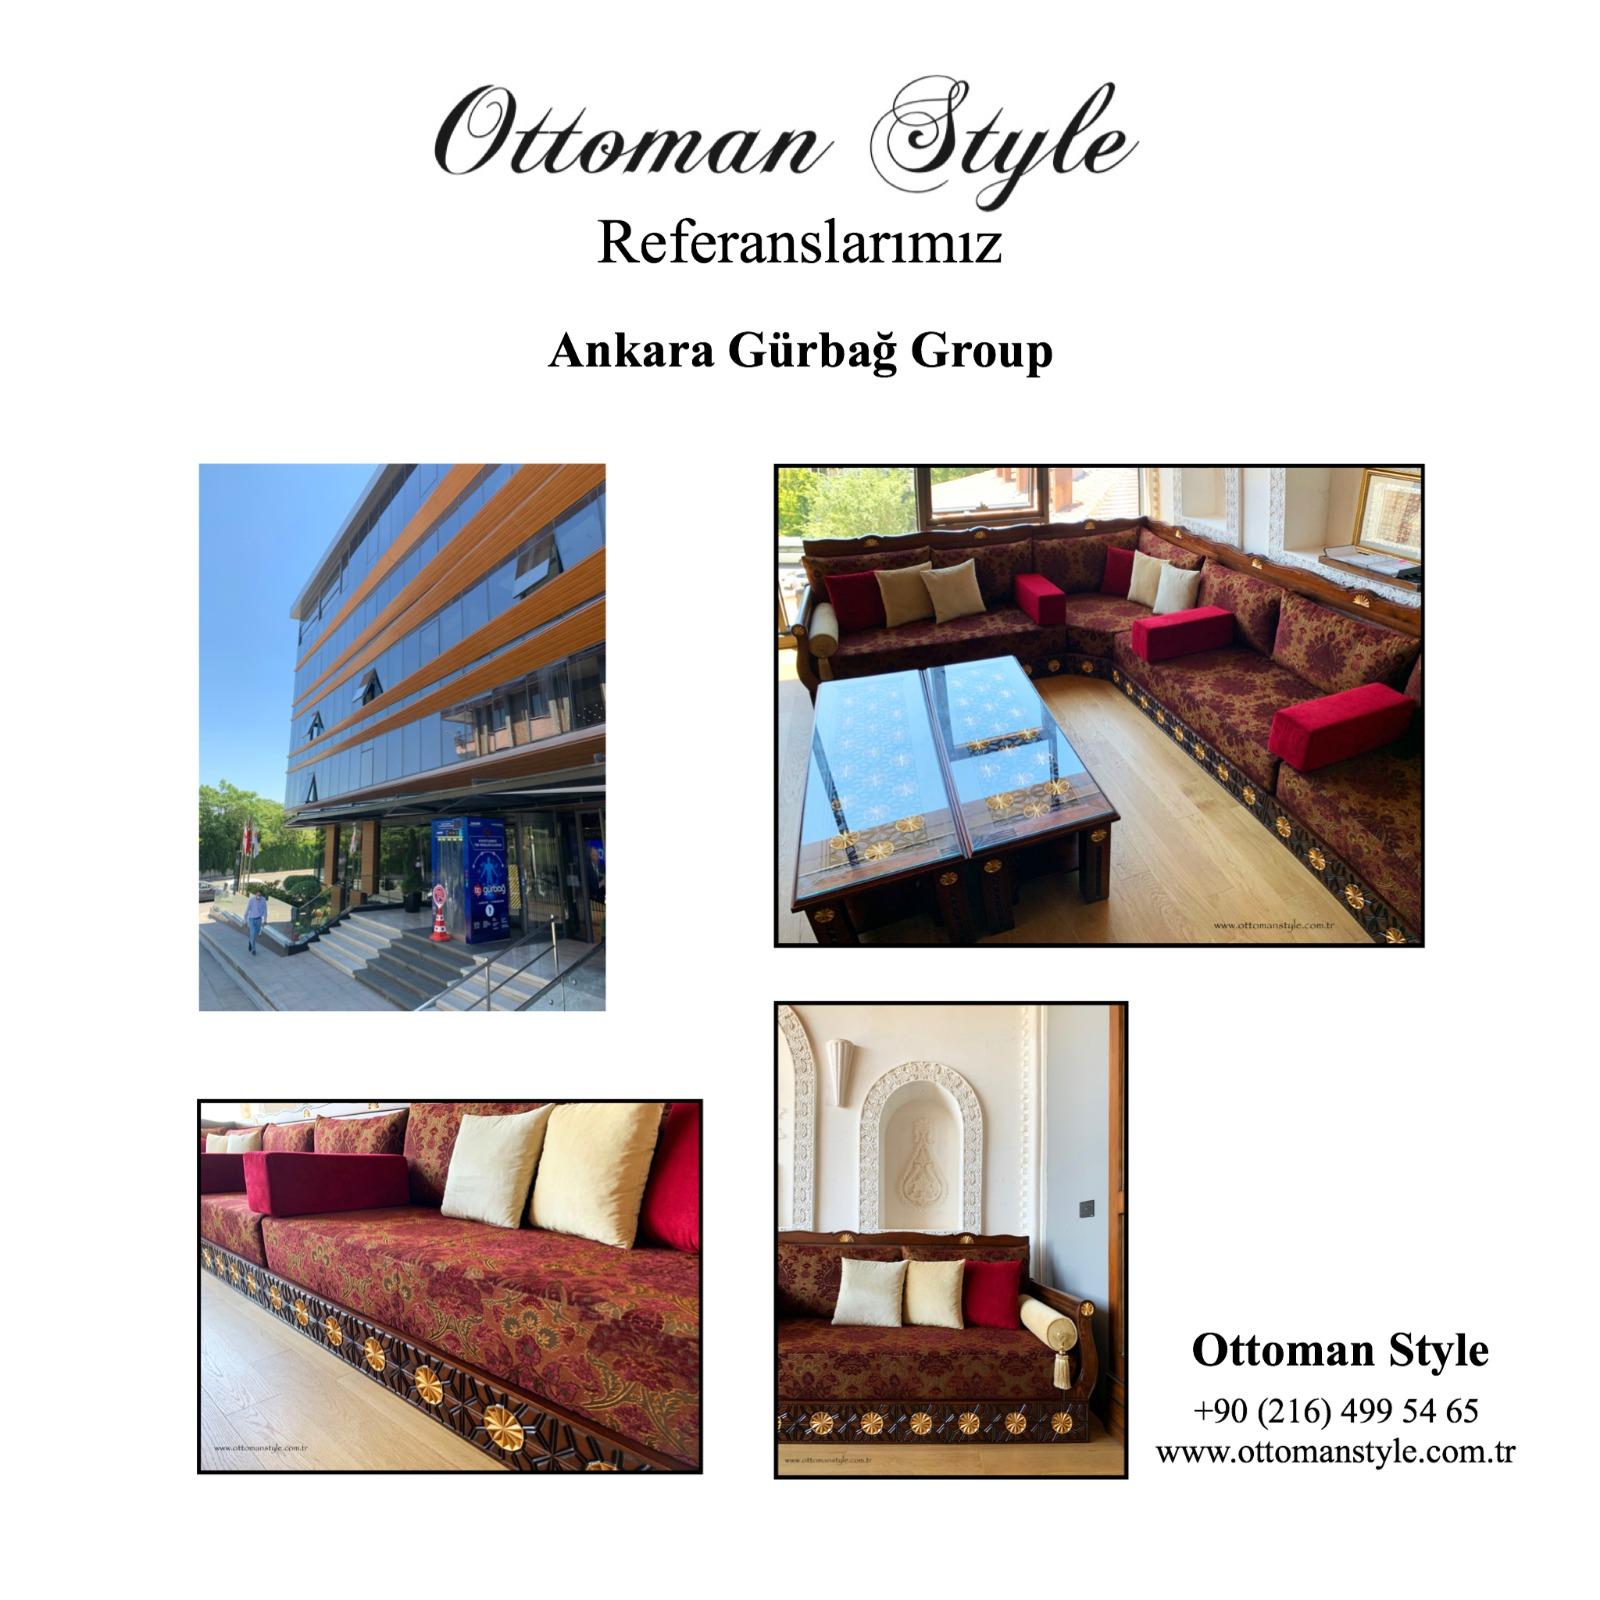 Ankara Gürbağ Grup